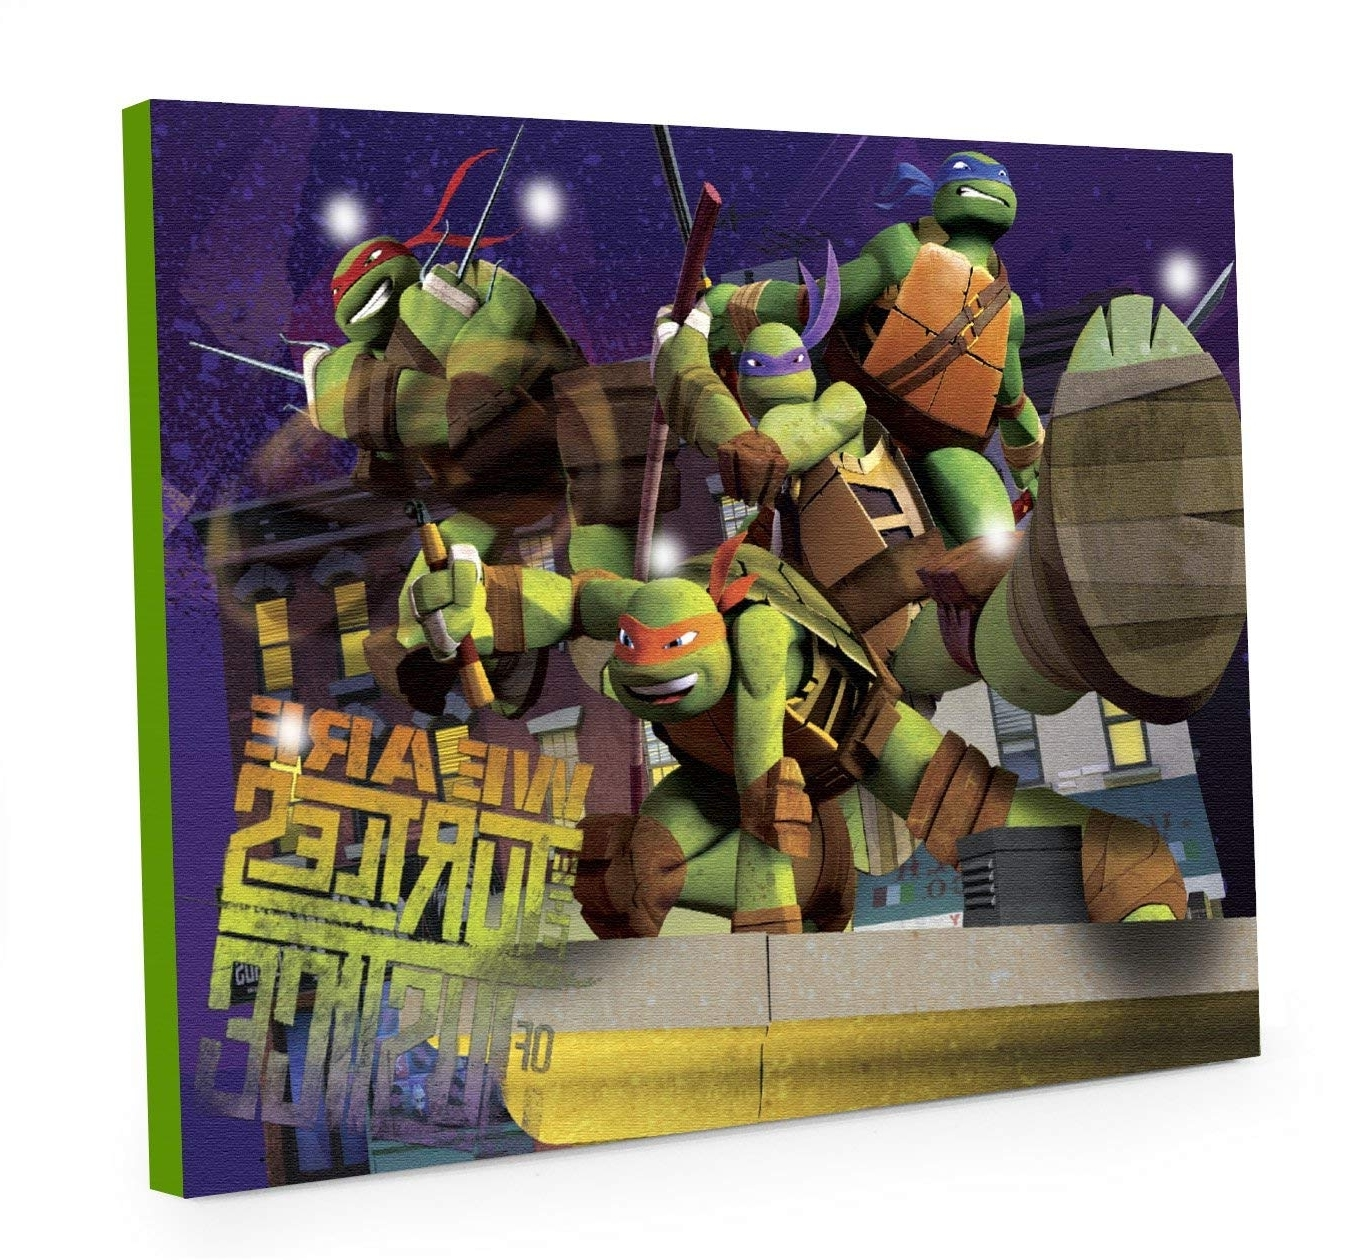 Well Liked Nickelodeon Teenage Mutant Ninja Turtles – Decor Intended For Ninja Turtle Wall Art (View 12 of 15)